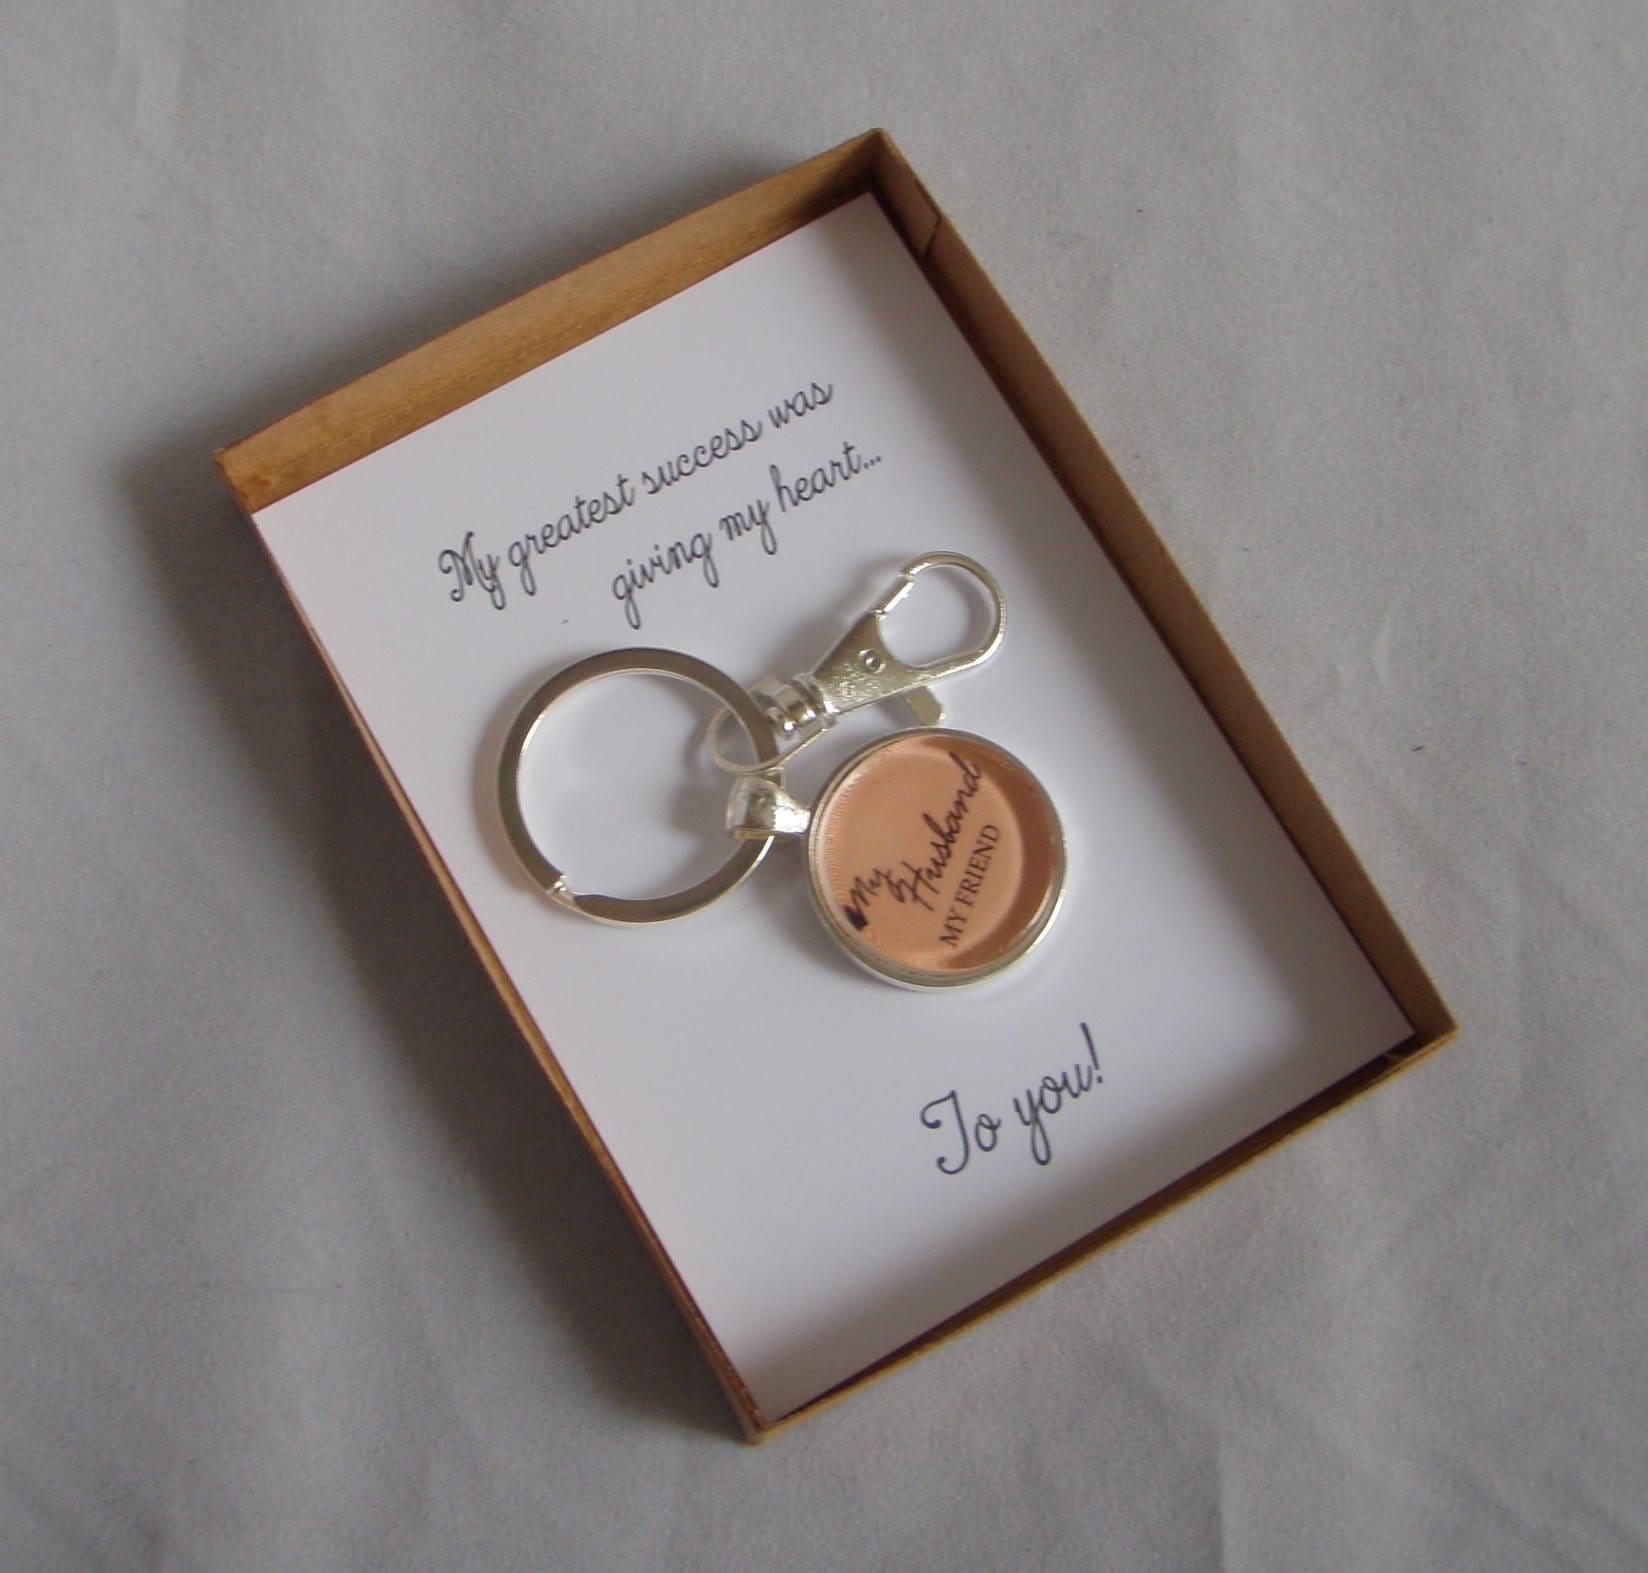 Husband Gift My Greatest Success Was Key Ring Hsband